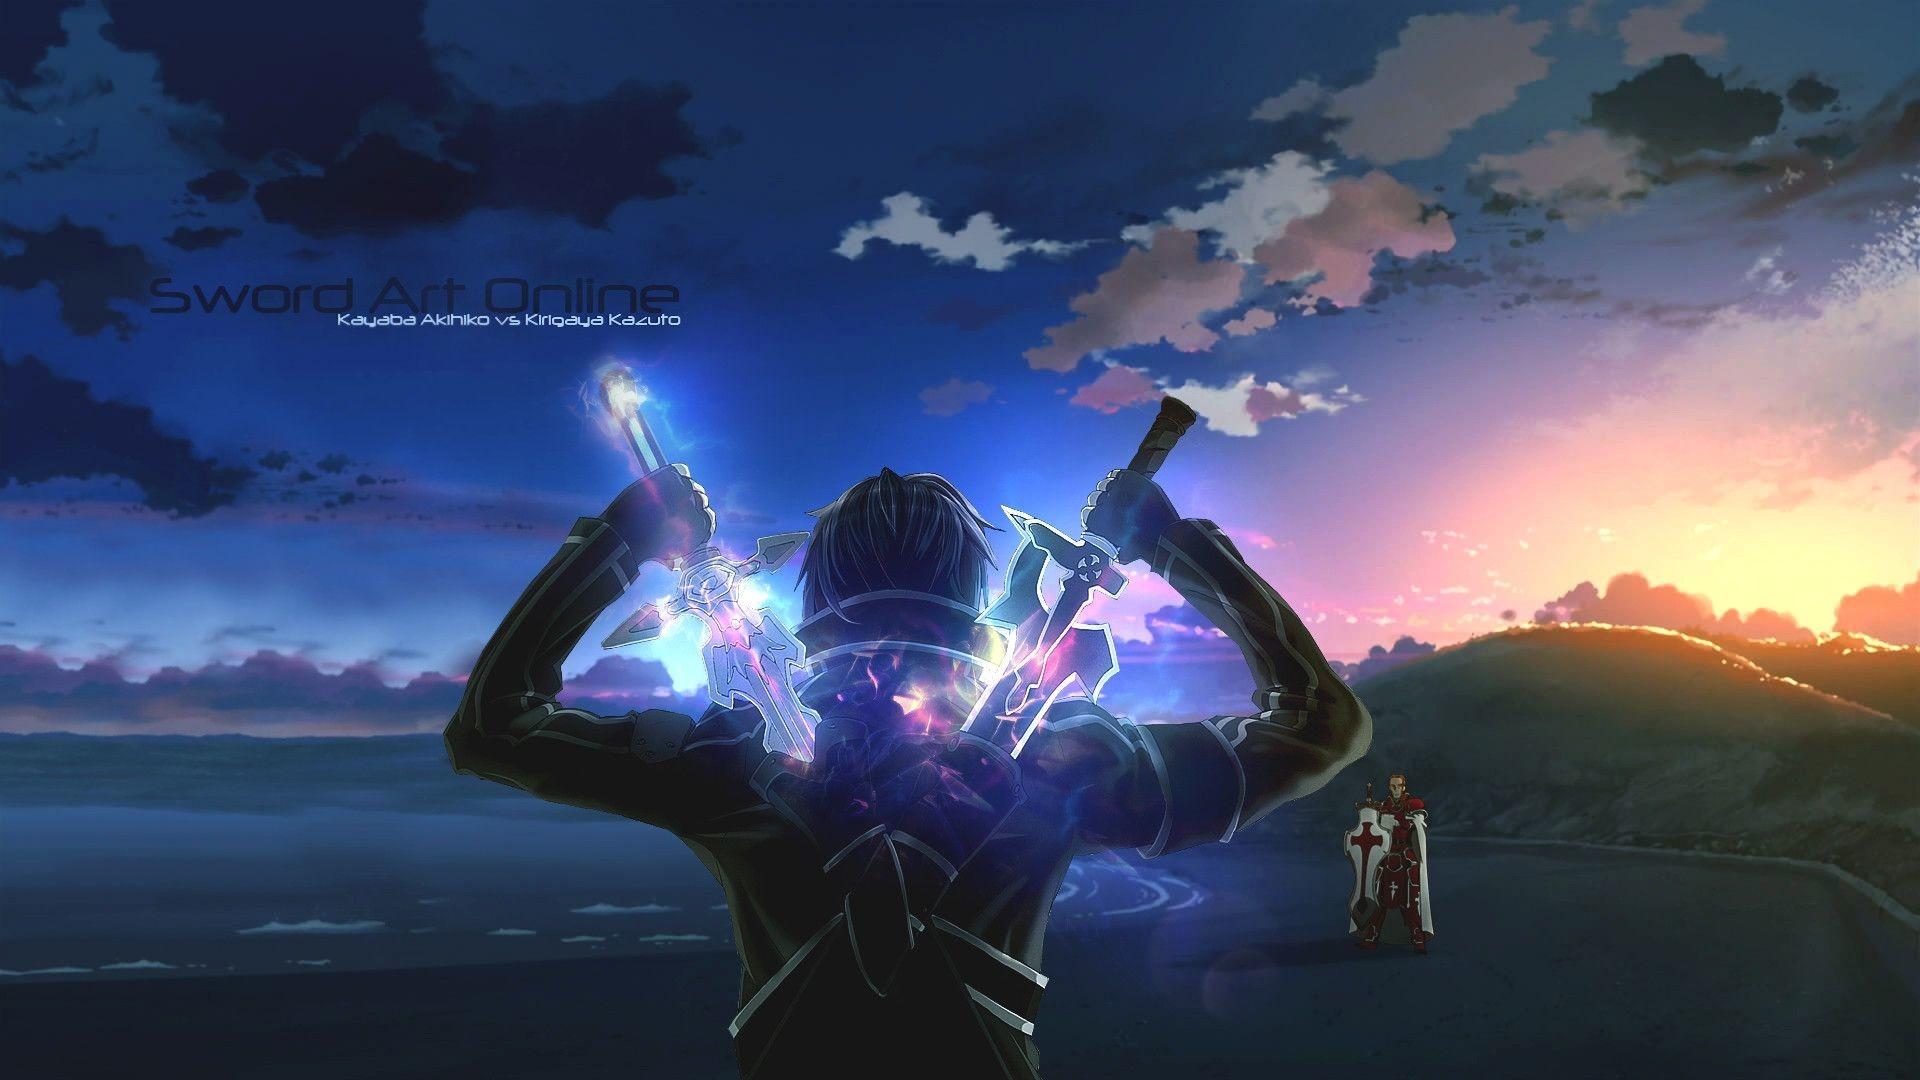 … Anime Wallpaper Full HD Angel Scenery Dark Headphones Music .